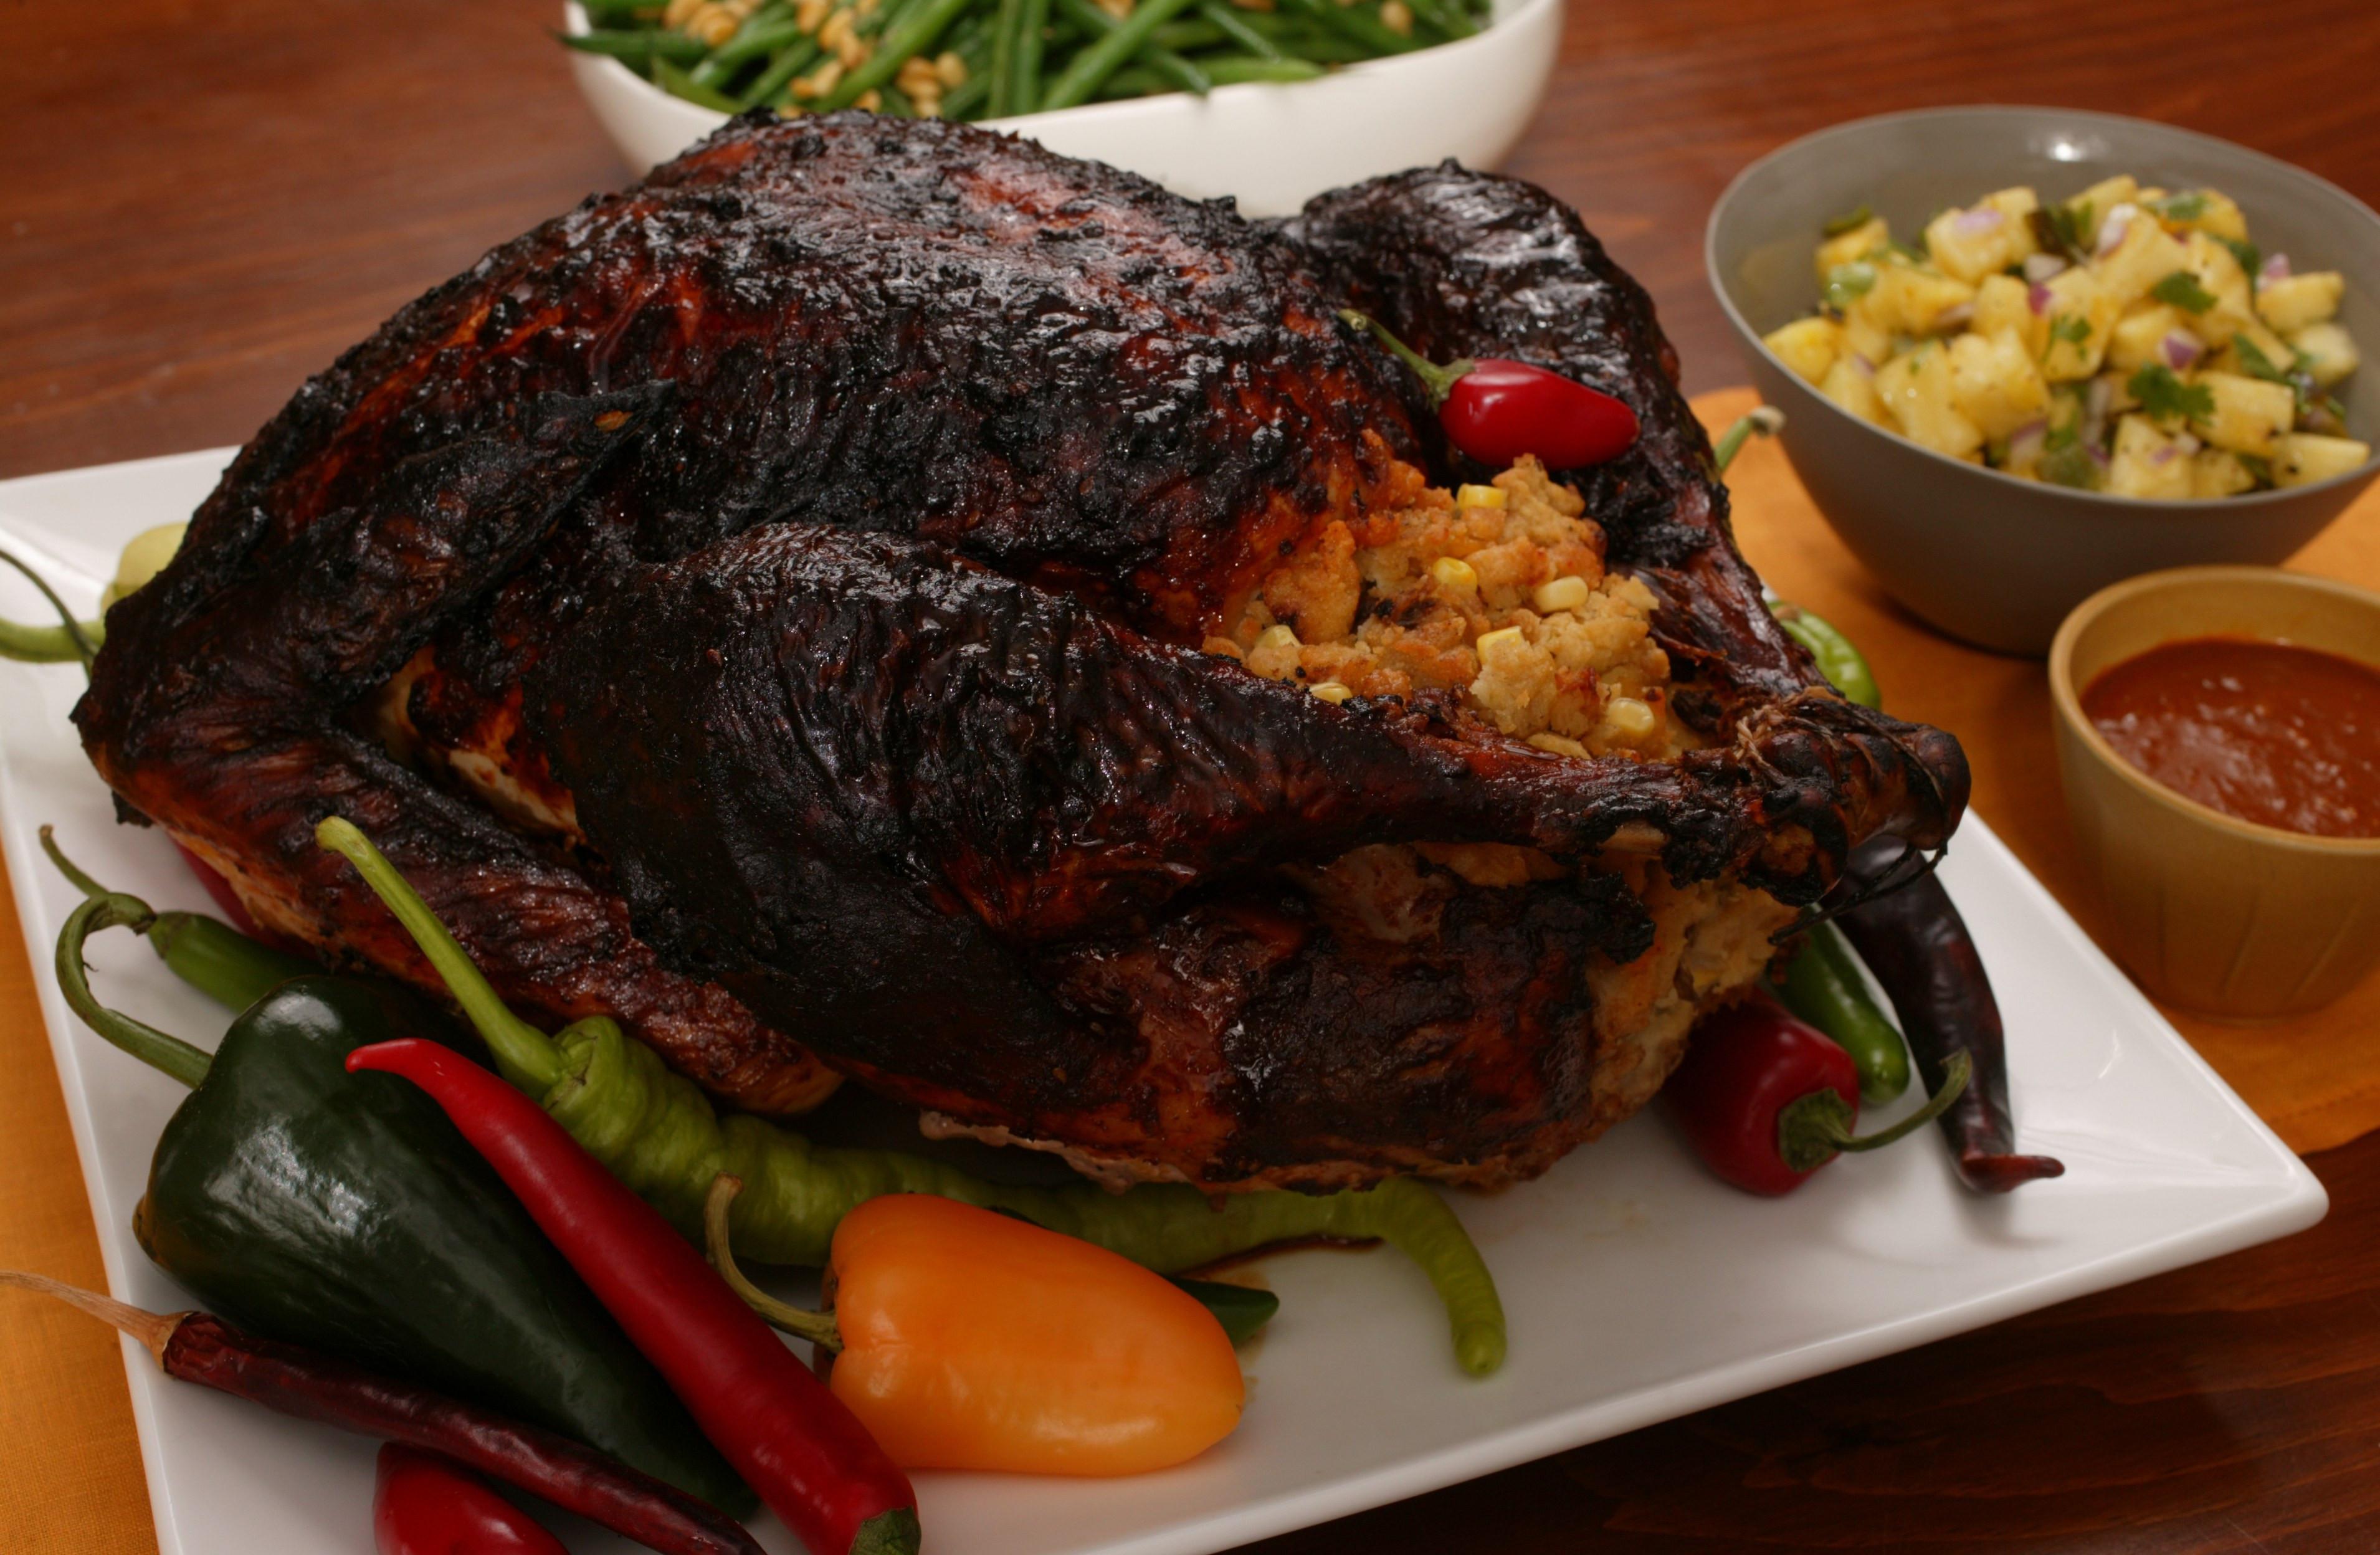 Roast Turkey Recipes Thanksgiving  Mole Roasted Turkey with Masa Stuffing and Chile Gravy